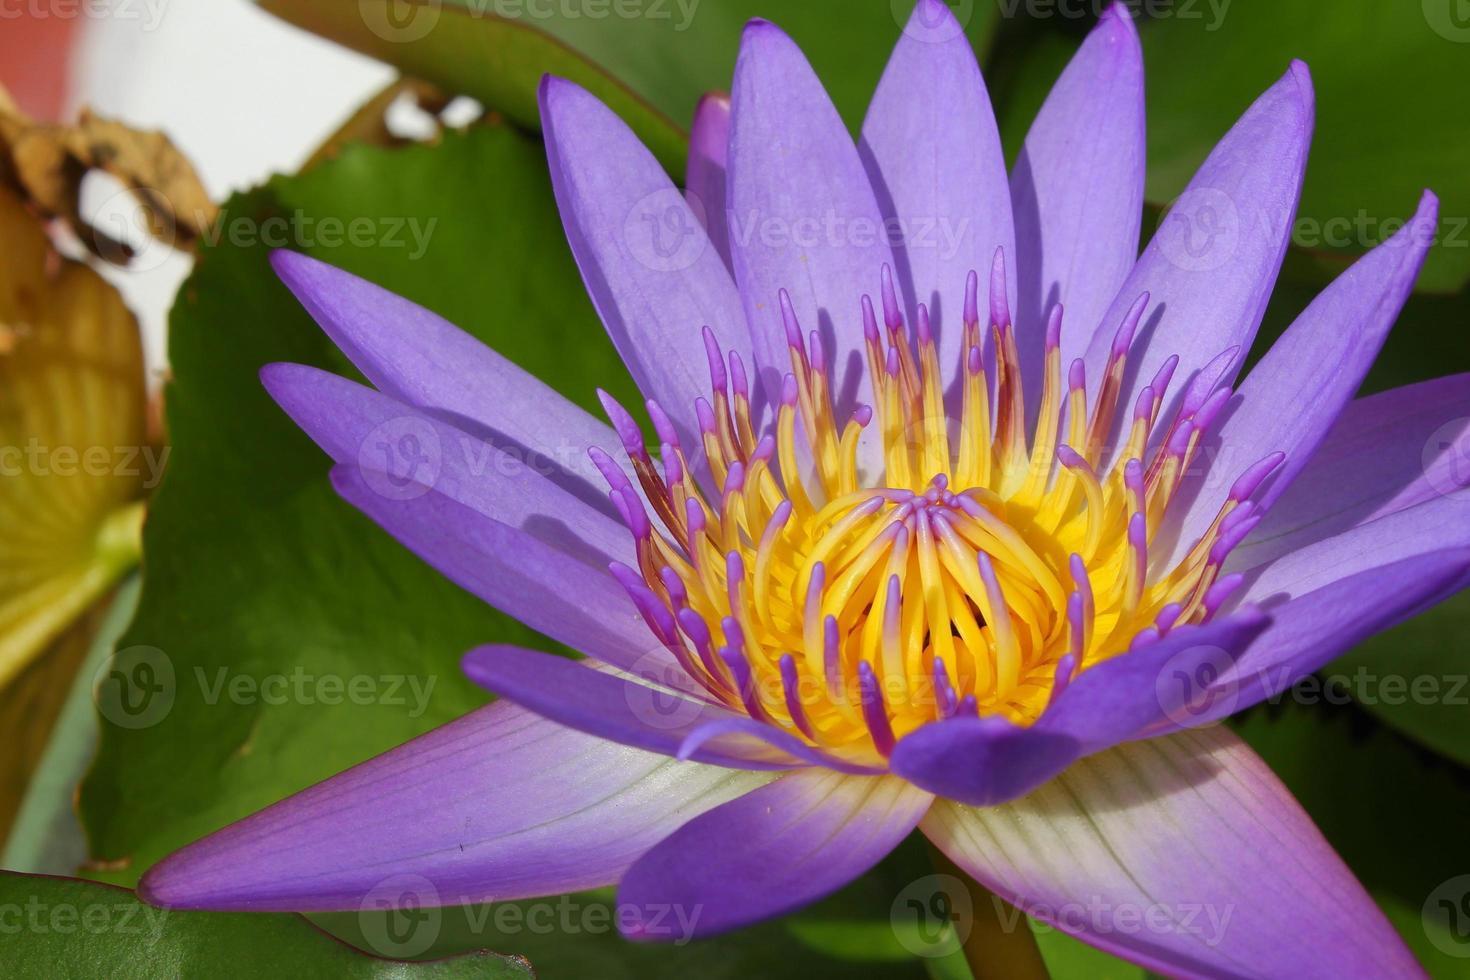 närbild vacker lila näckros pollen foto